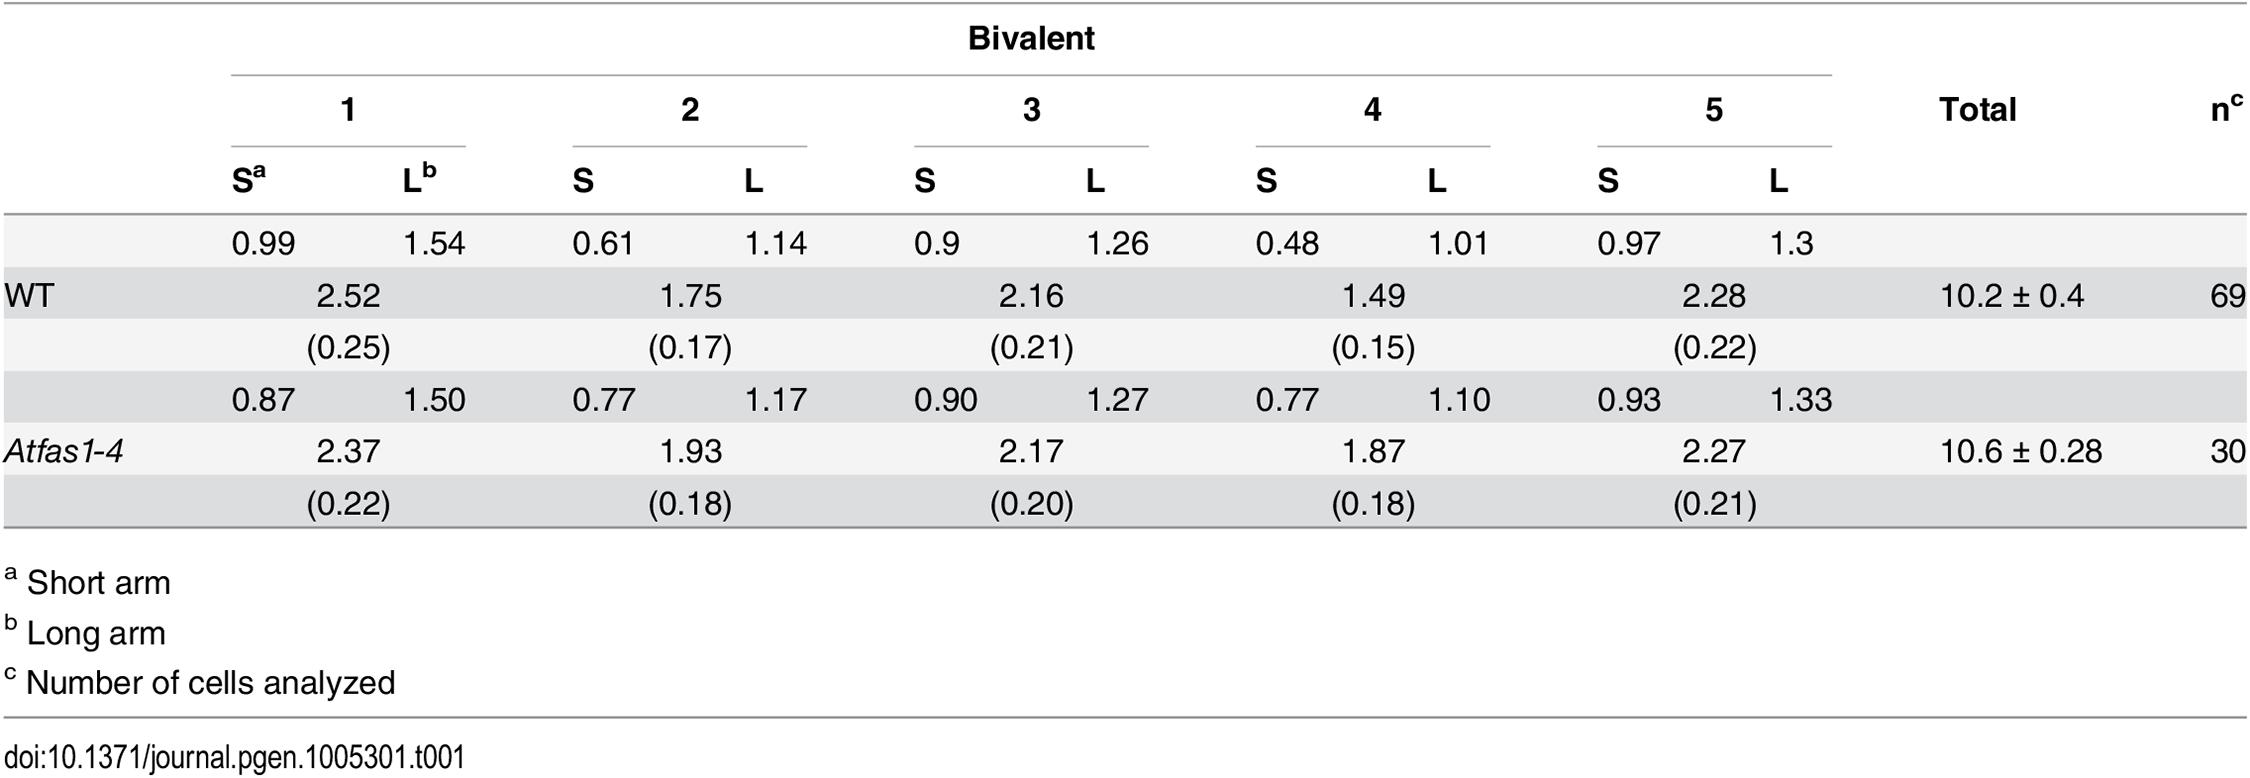 Mean chiasma frequencies per cell, per bivalent, and per bivalent arm.